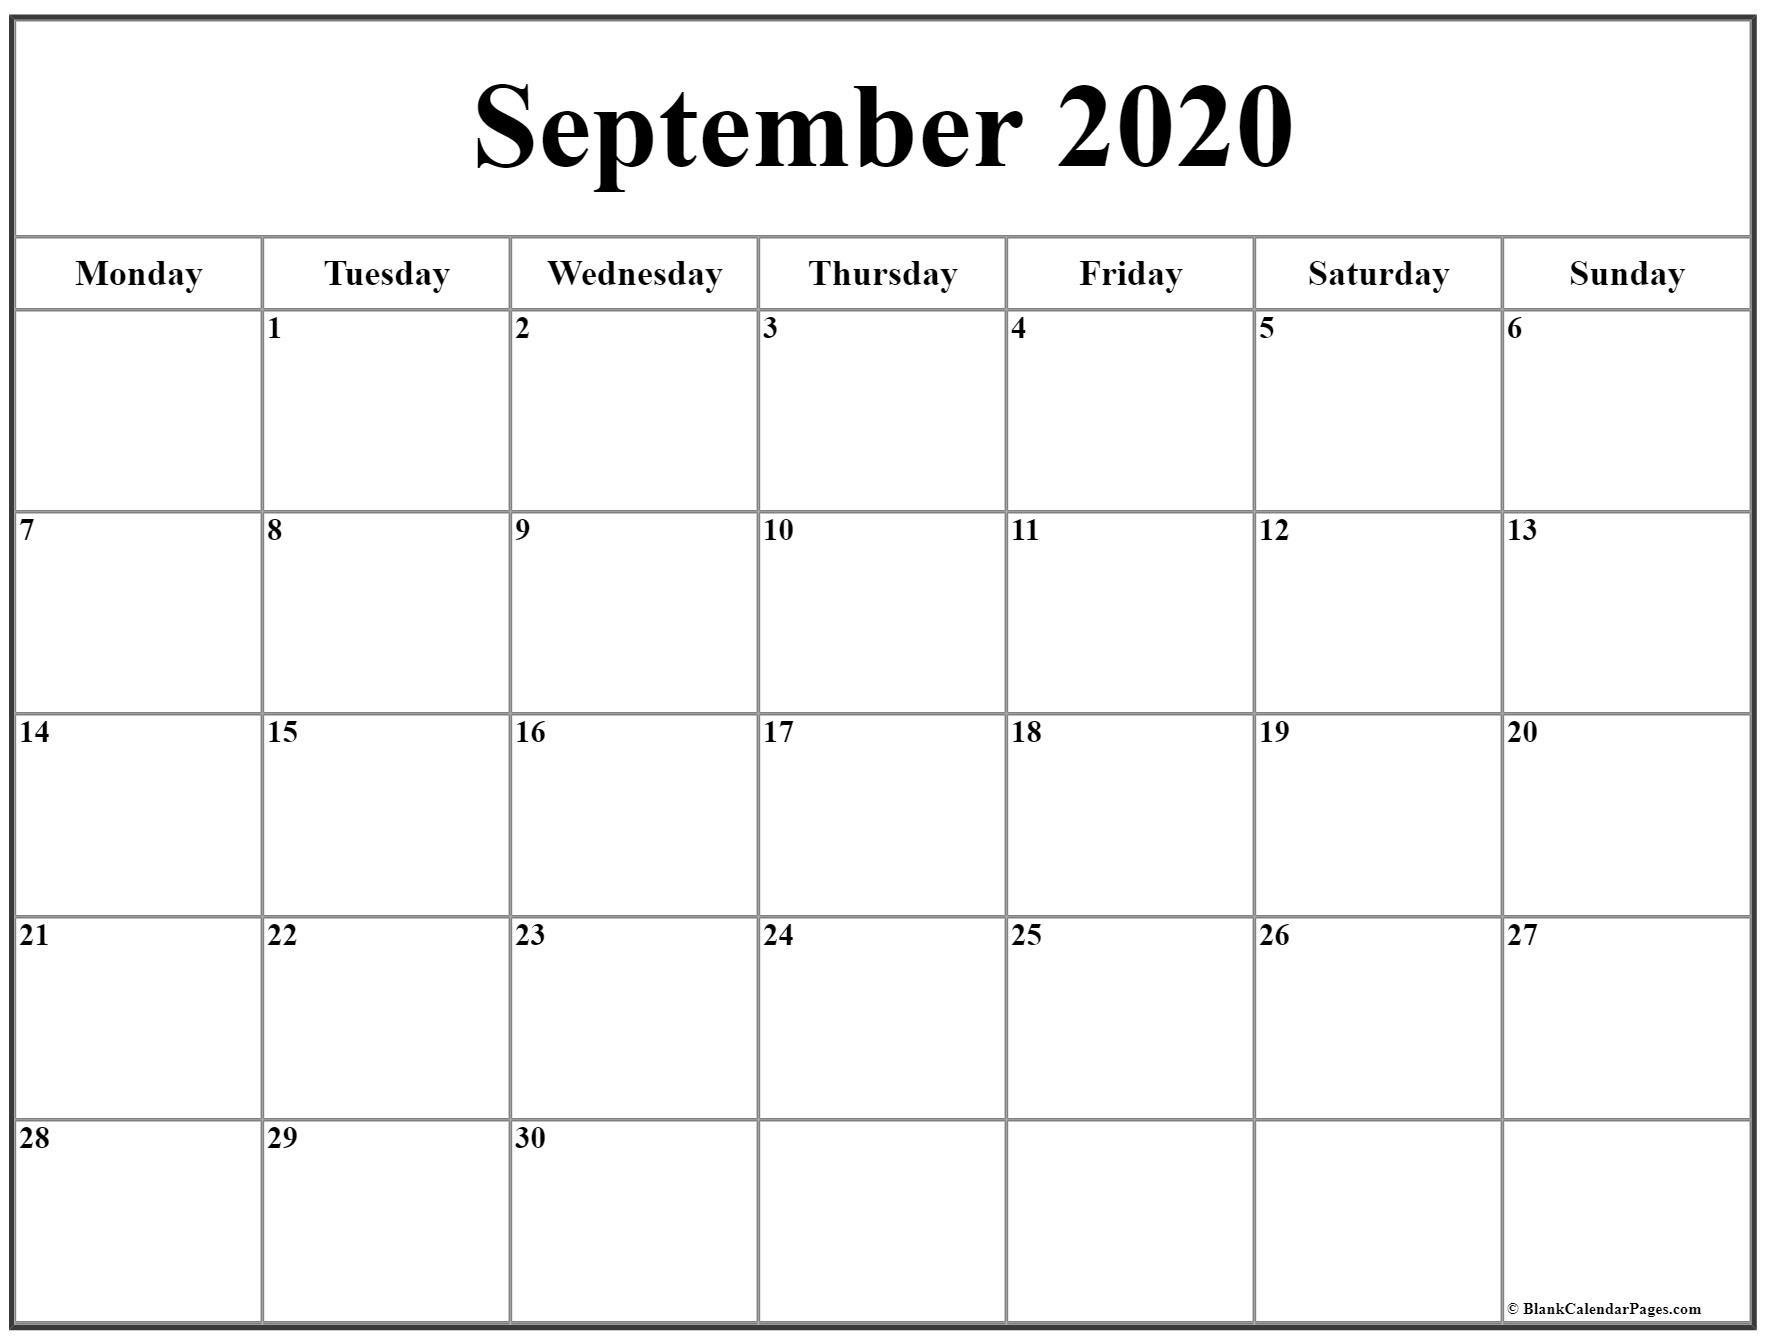 September 2020 Monday Calendar   Monday To Sunday inside 2020 Month Calendar Sunday Through Saturday